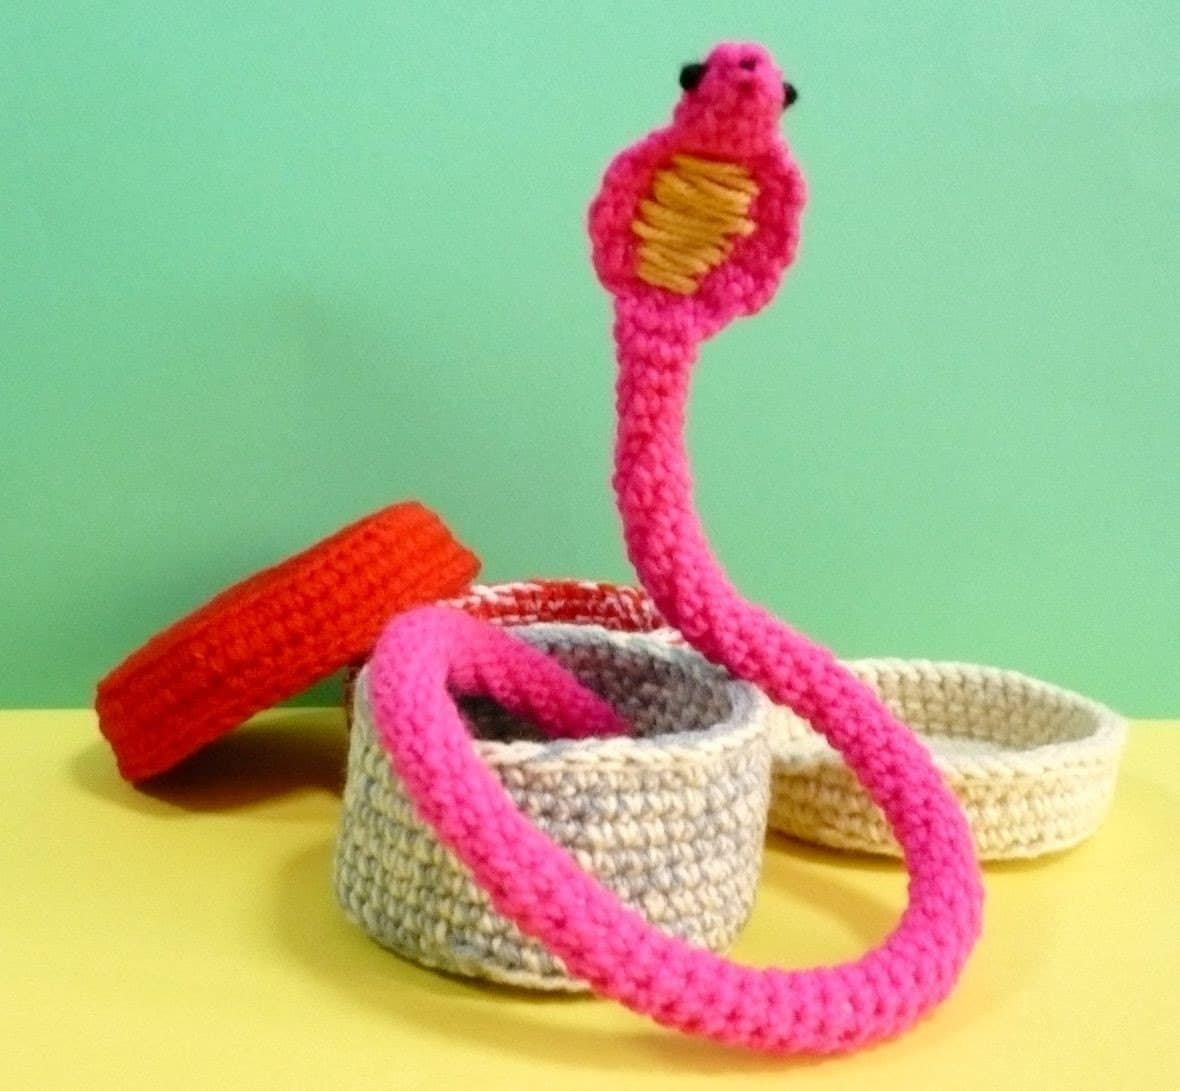 CROCHET DOLPHIN PATTERNS Crochet Patterns